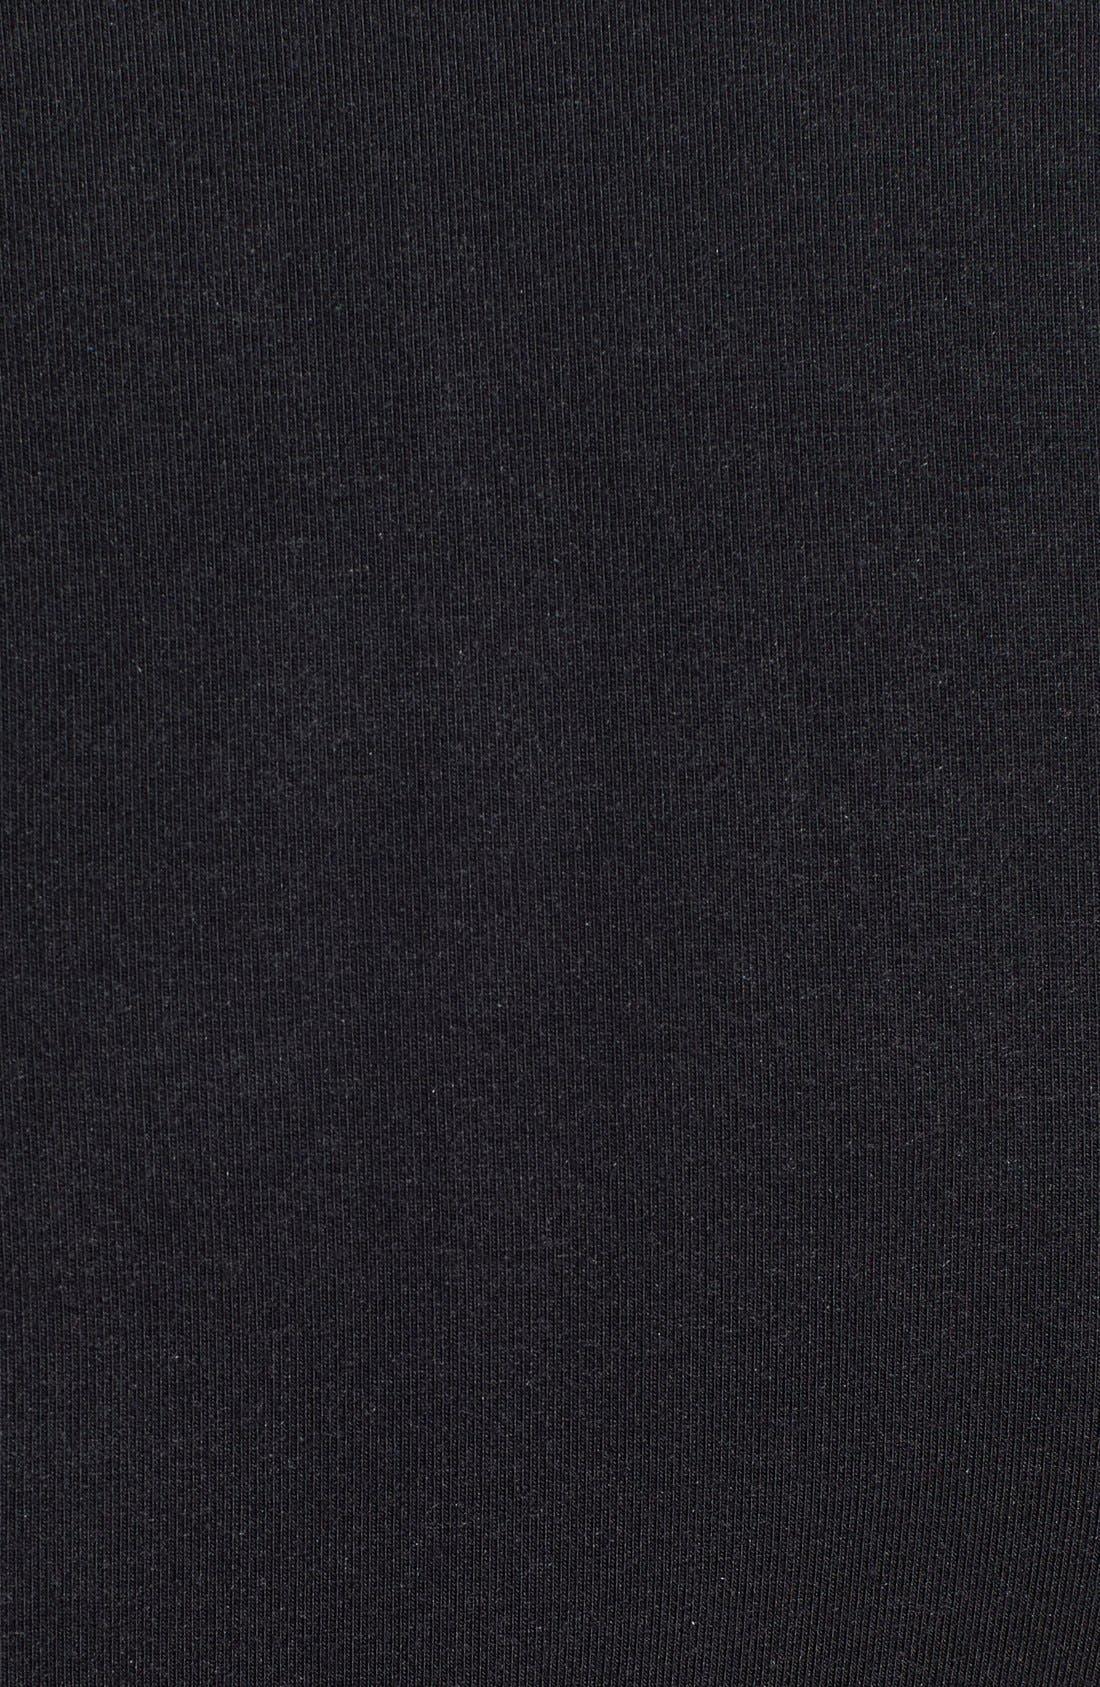 Side Zip Long Sleeve Top,                             Alternate thumbnail 2, color,                             001